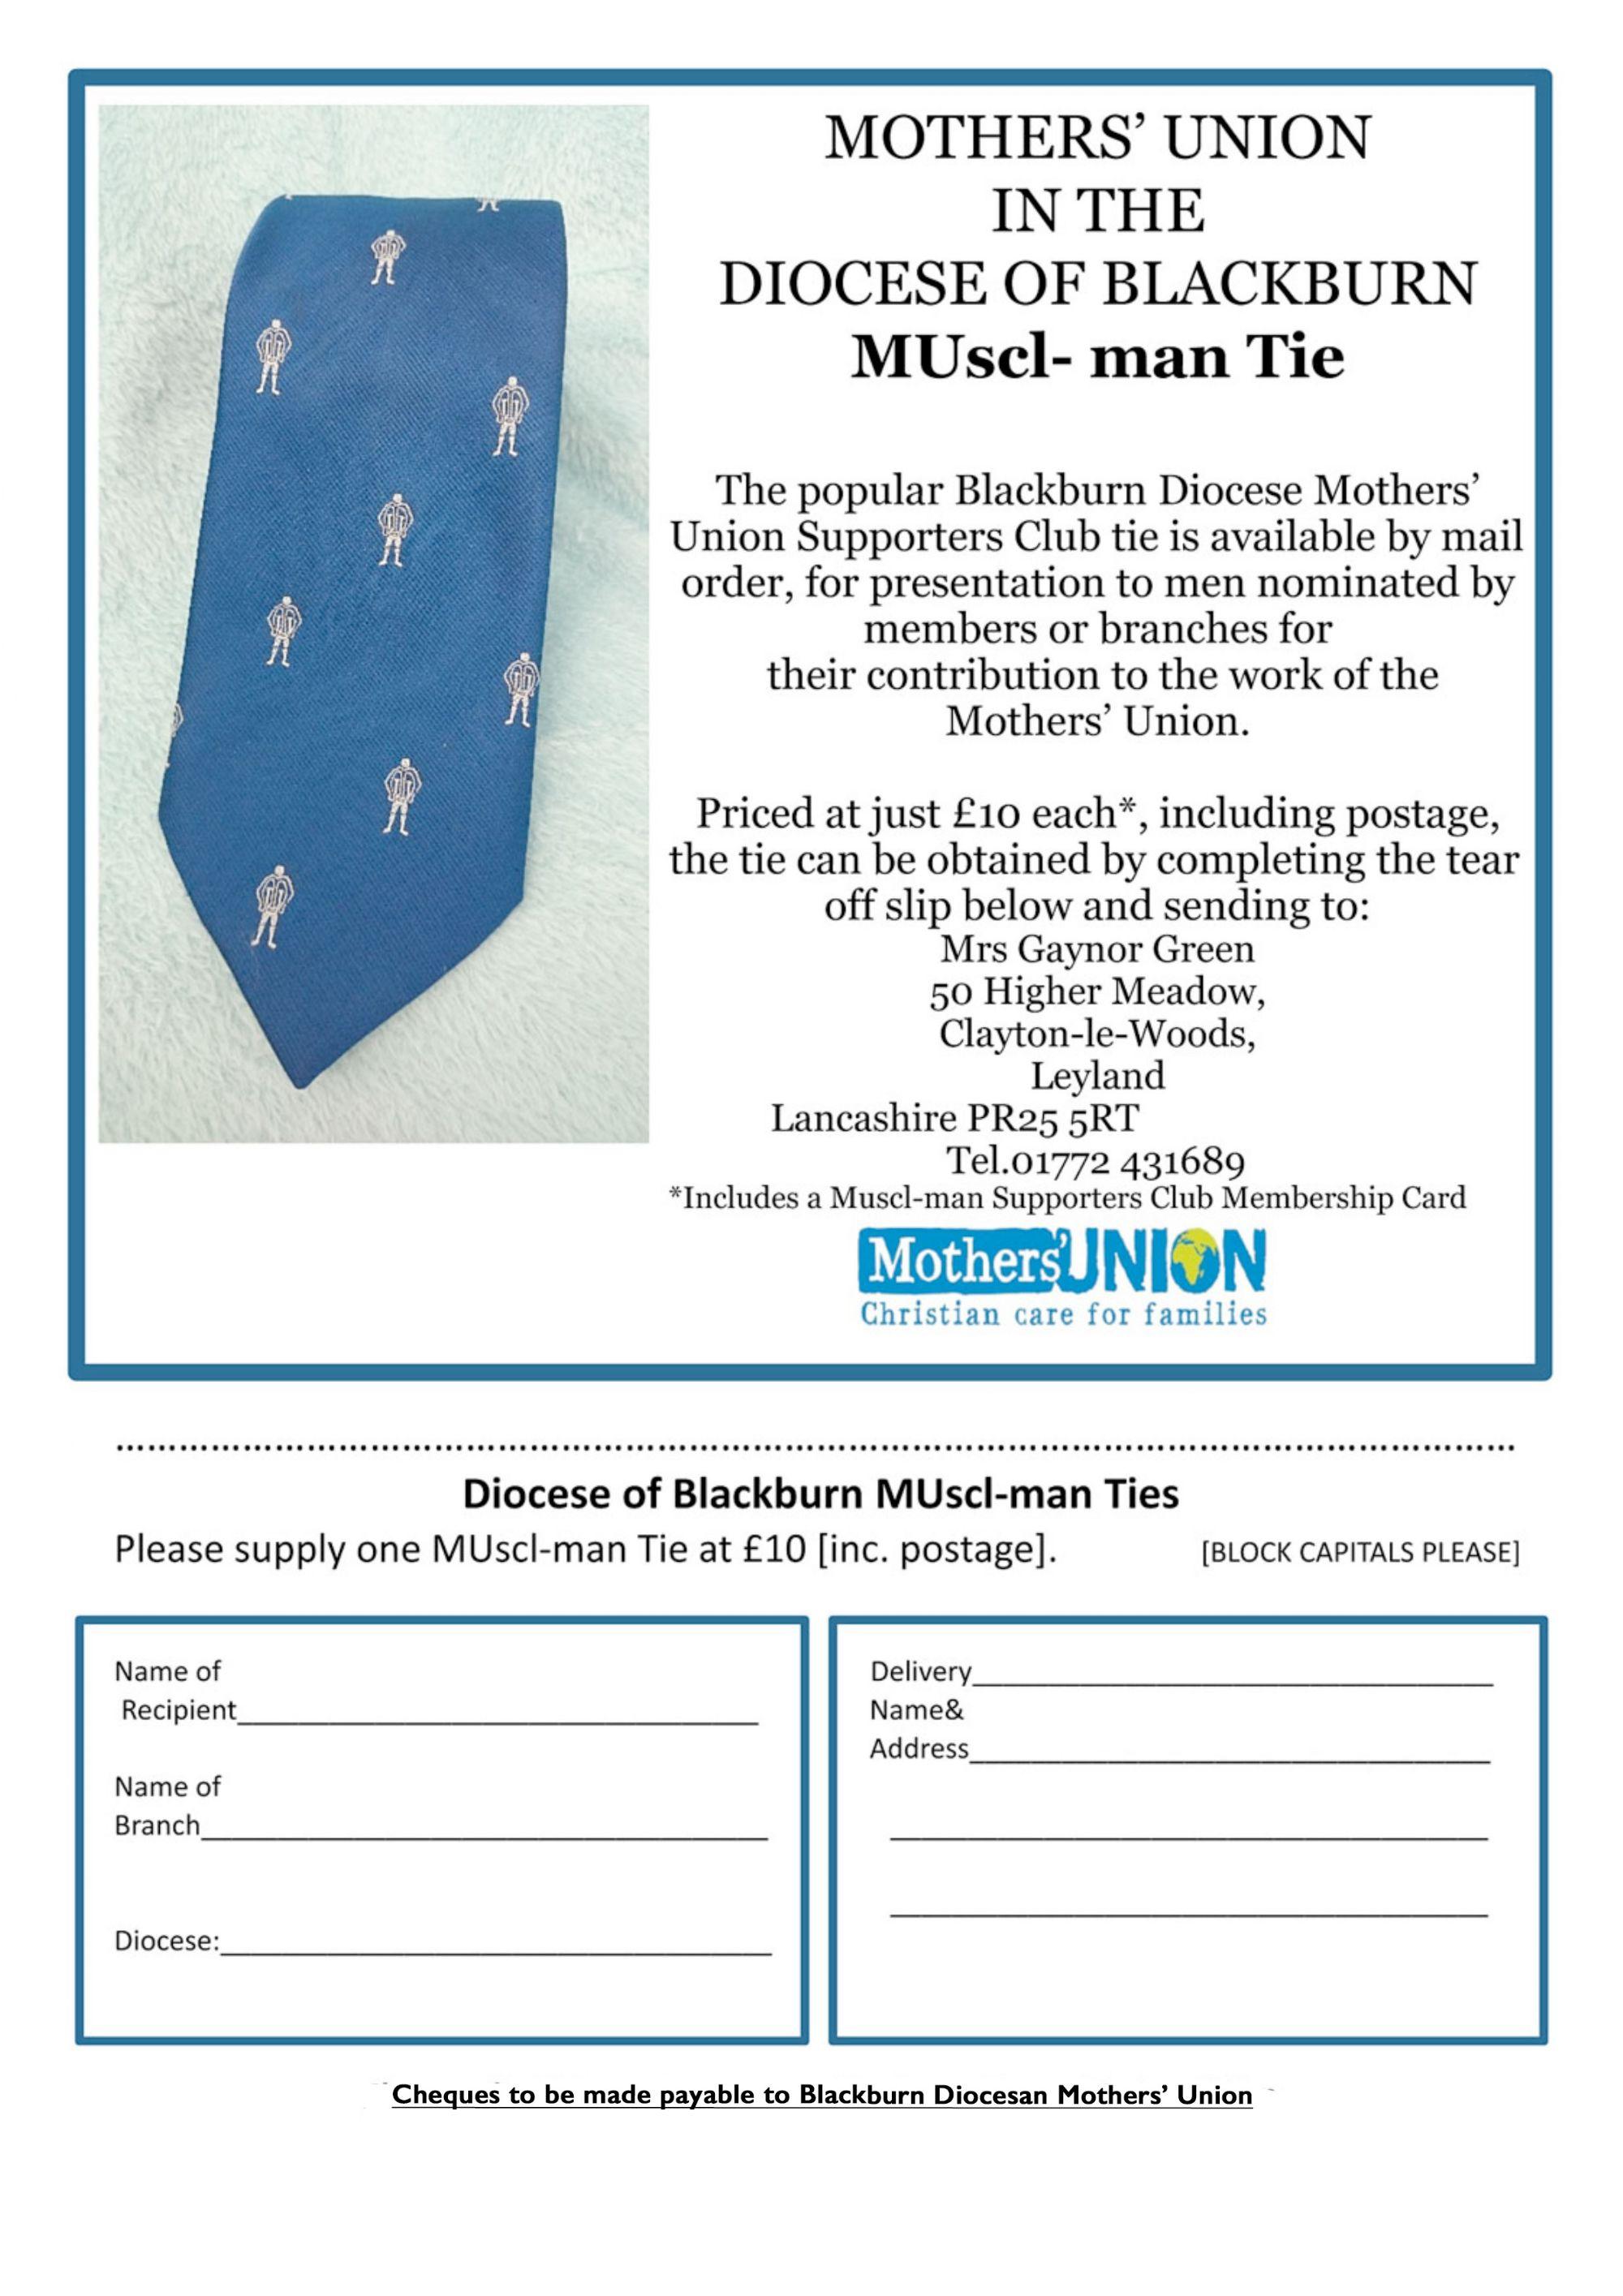 MUscl-man Tie